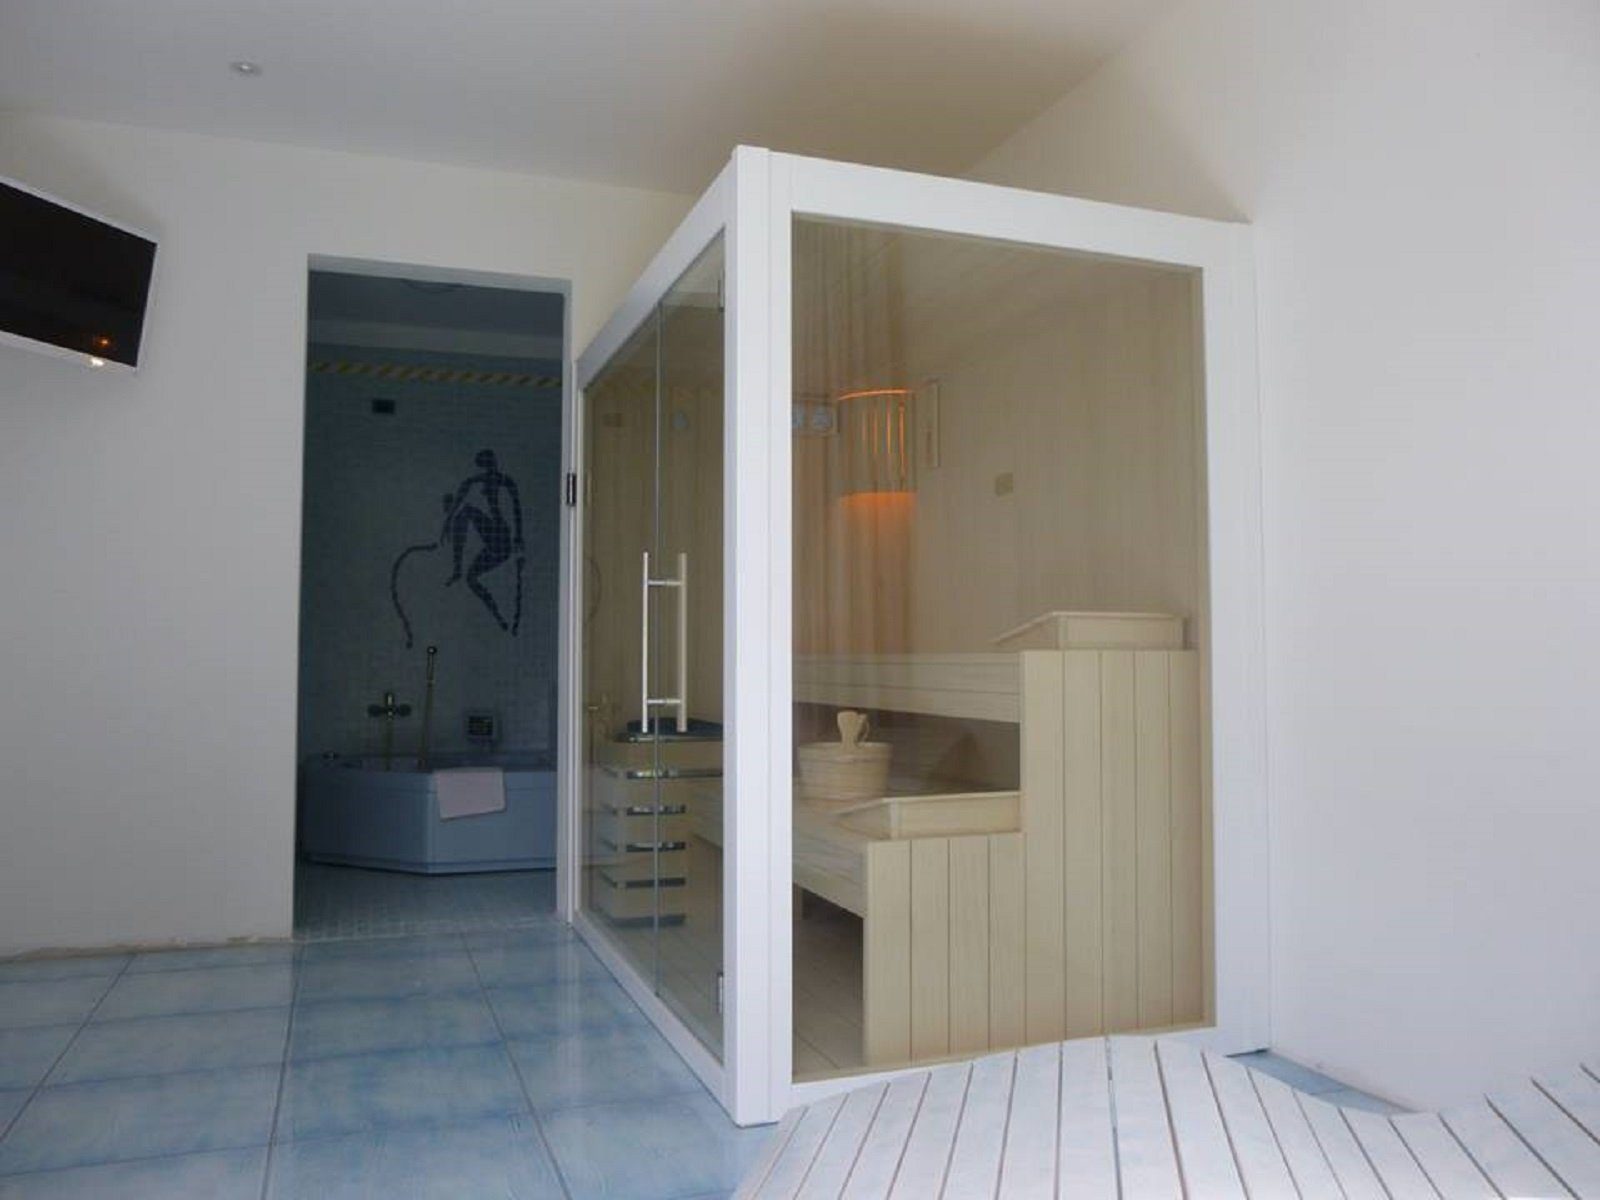 Trendy su misura saune with sauna per casa prezzi - Prezzi sauna per casa ...